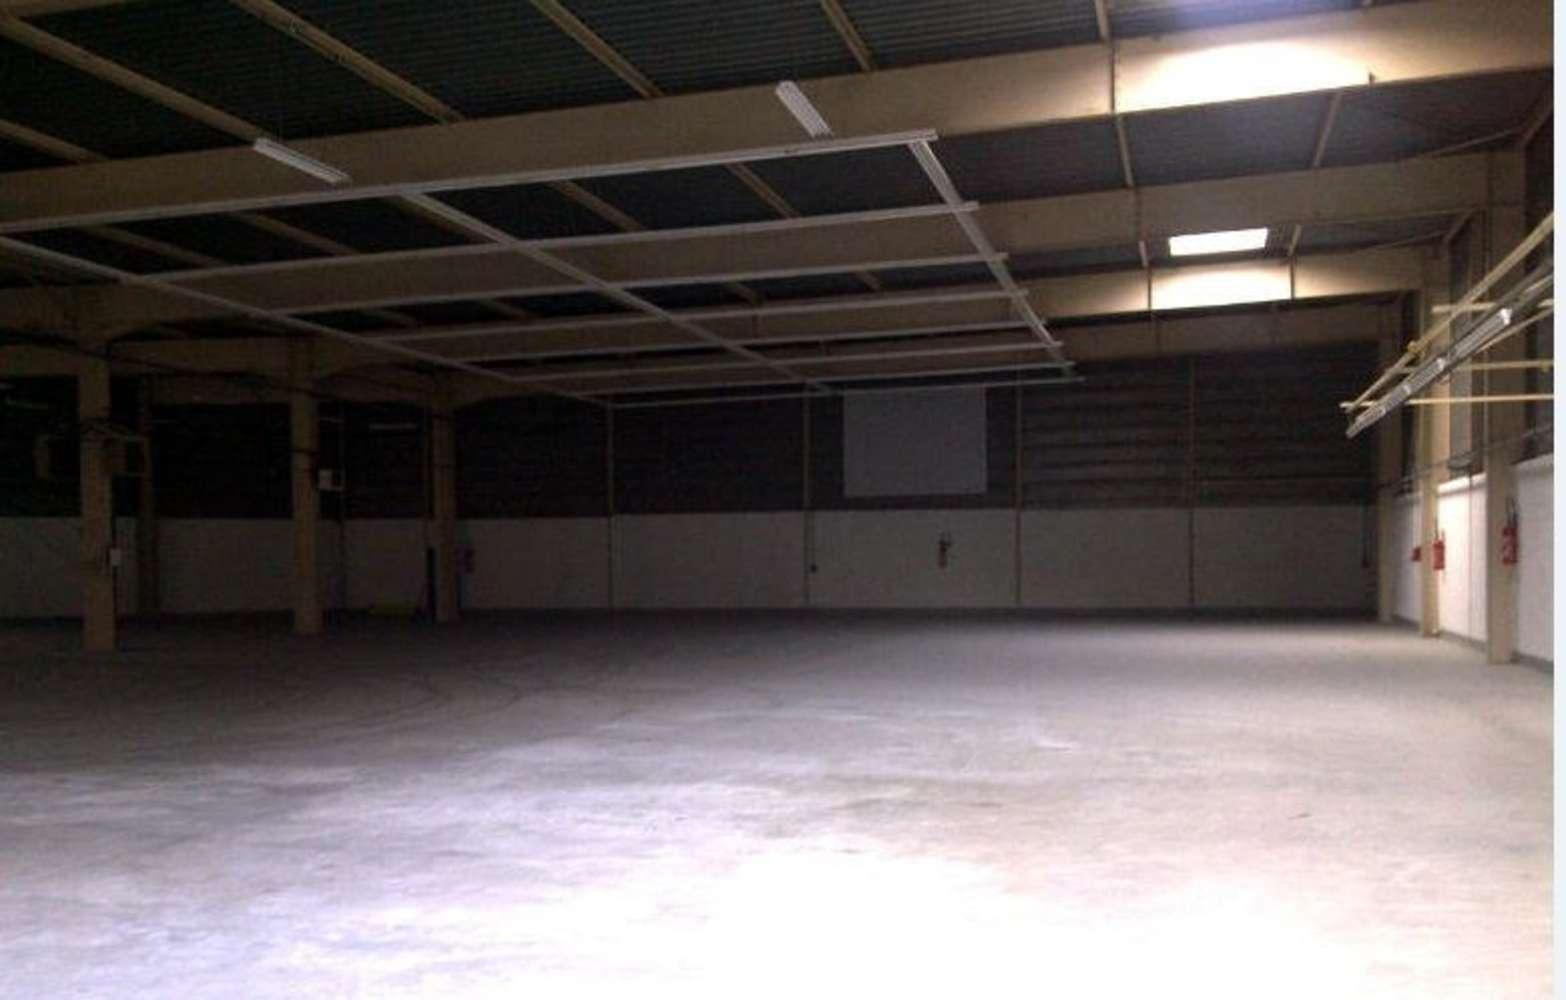 Activités/entrepôt Groslay, 95410 - 4 RUE DES ECRICROLLES - 9450505